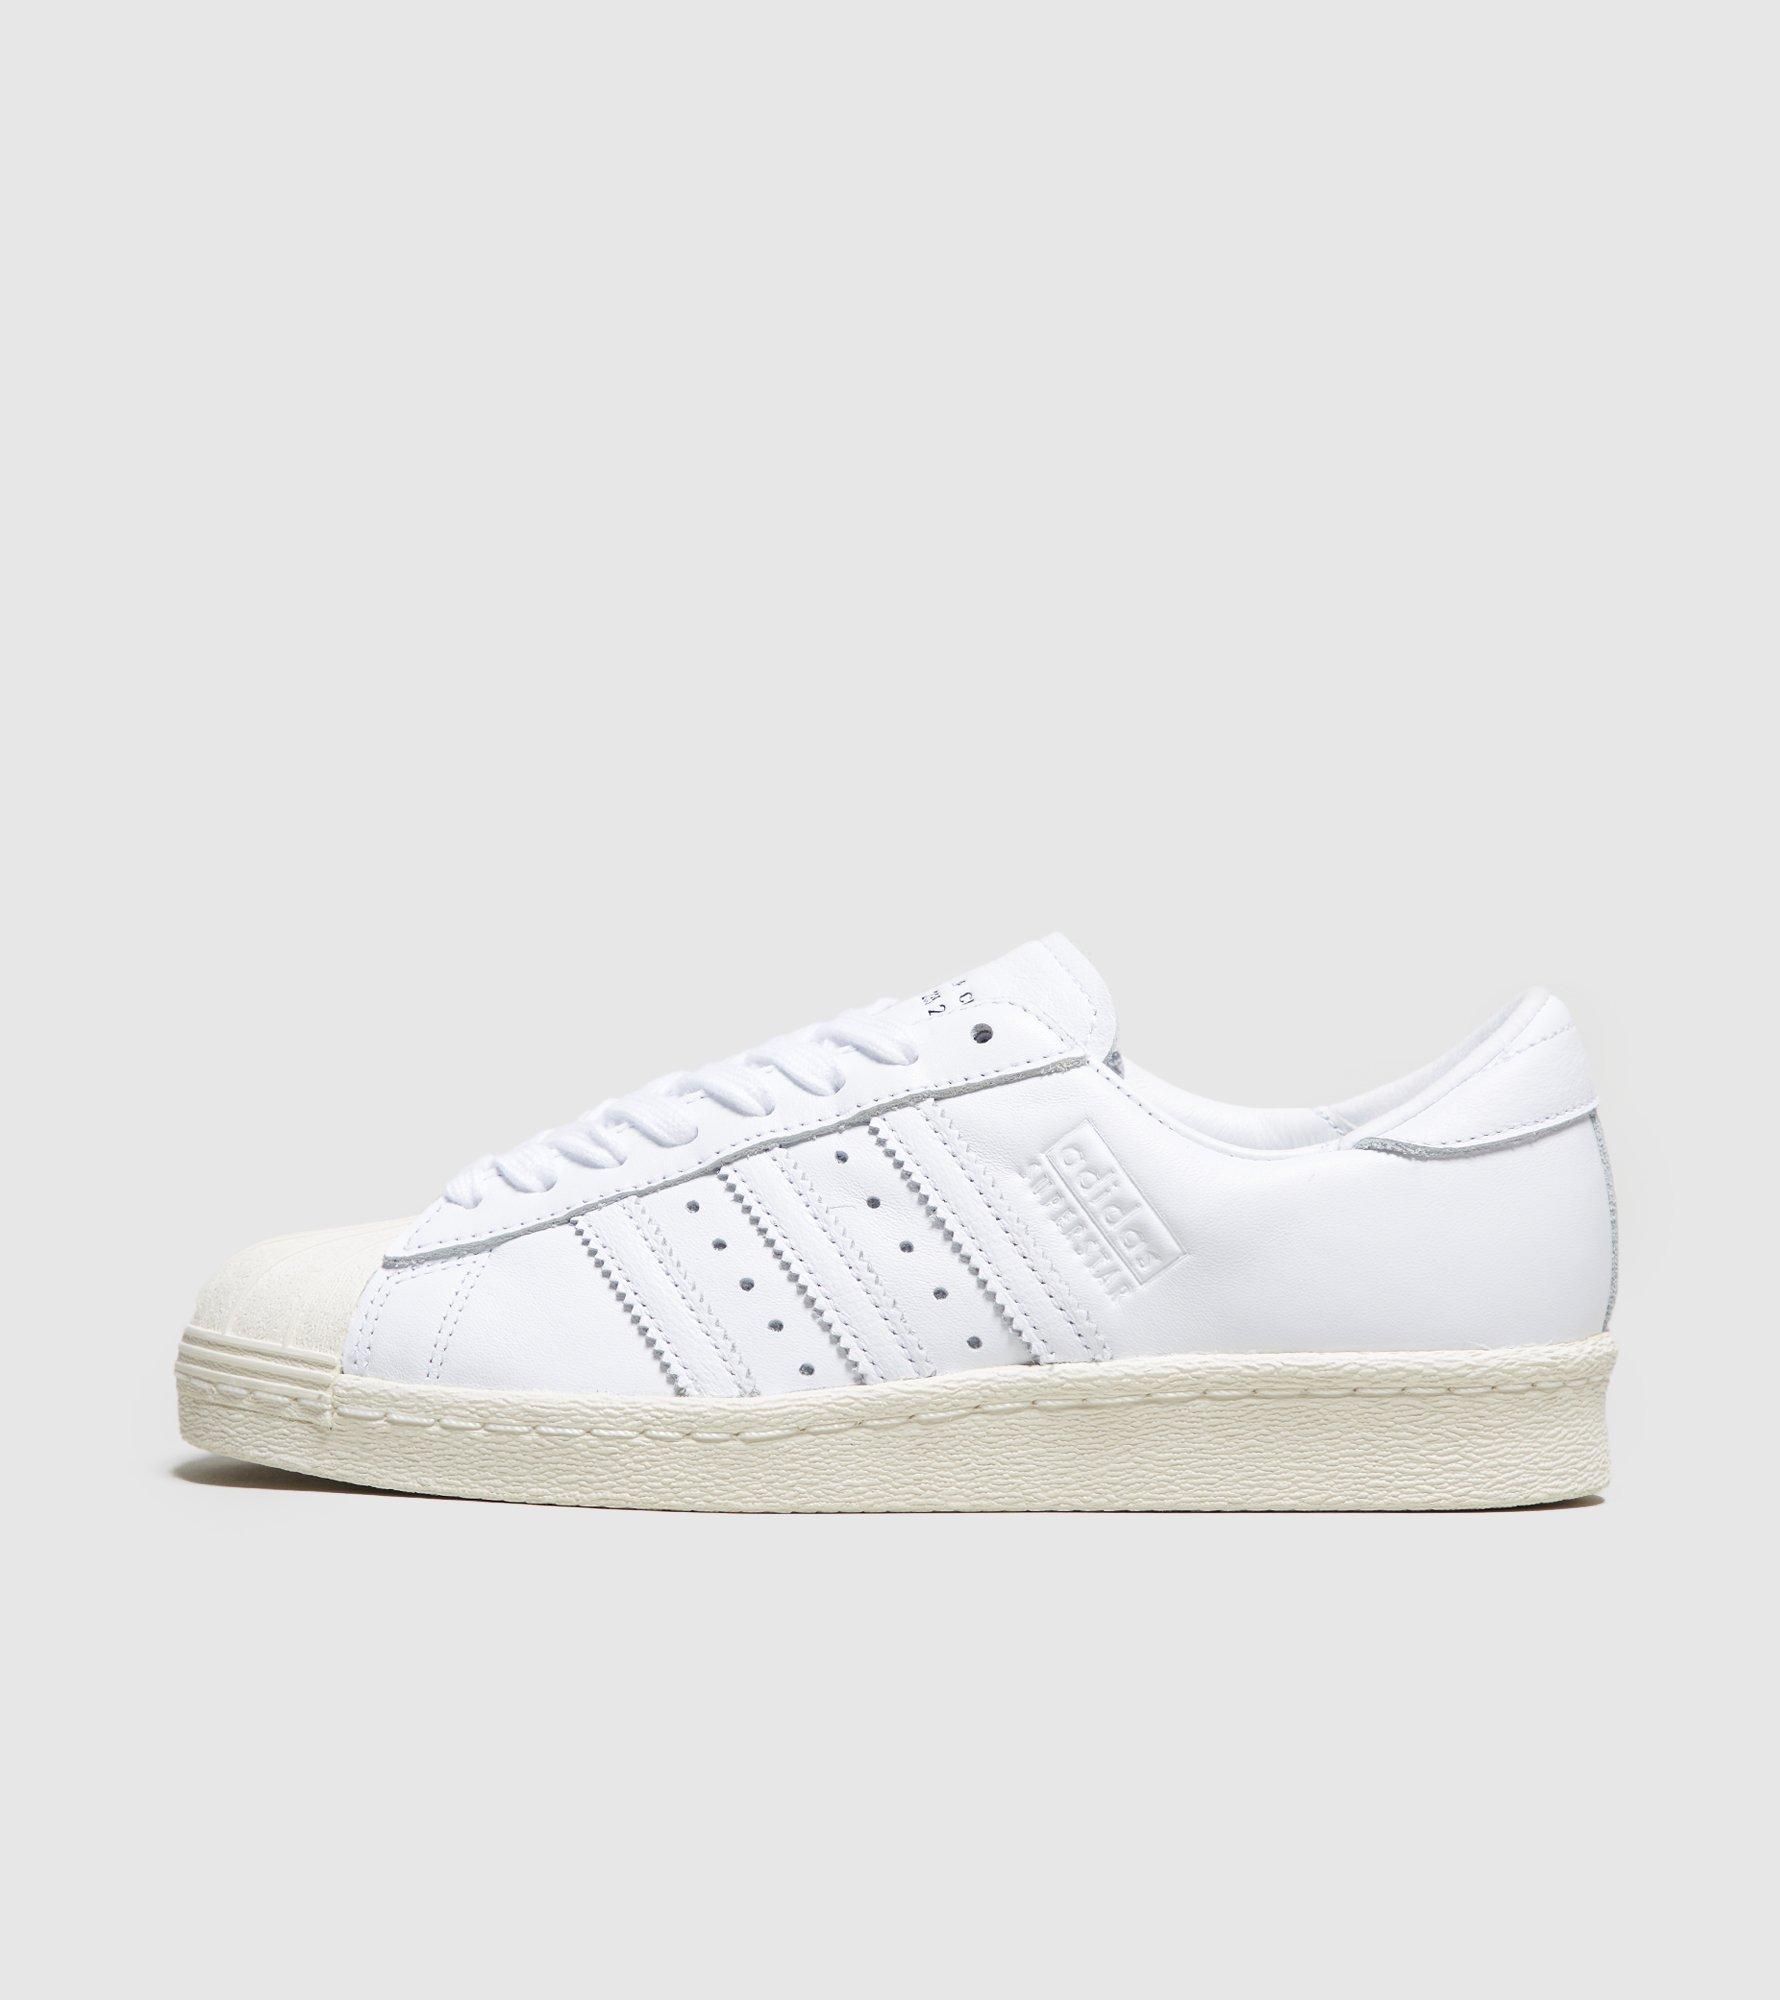 adidas Originals Superstar 80s Femme | Size?